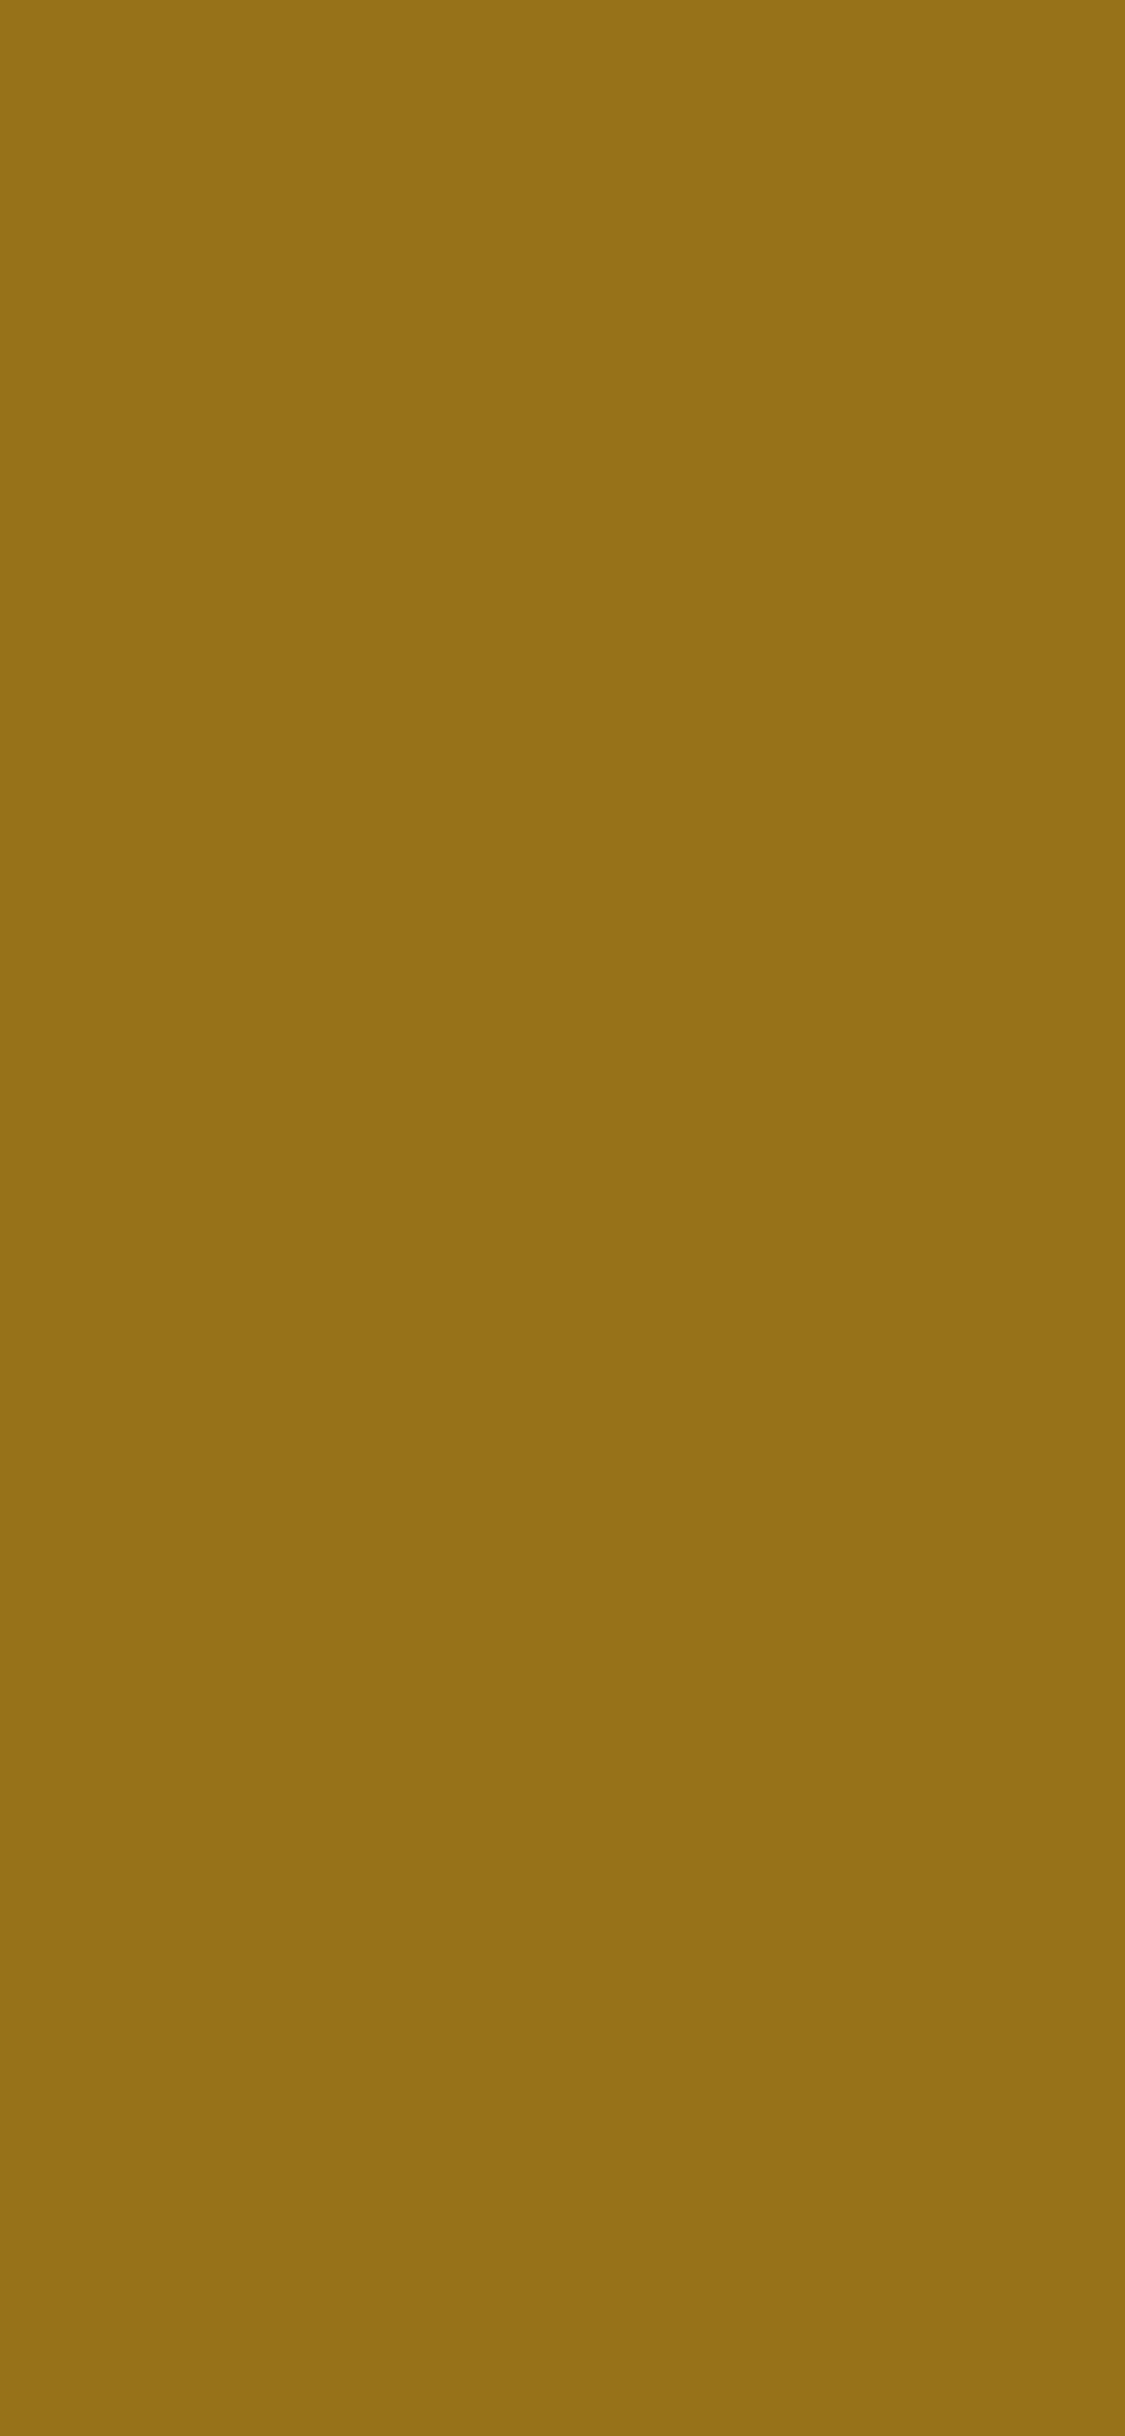 1125x2436 Mode Beige Solid Color Background